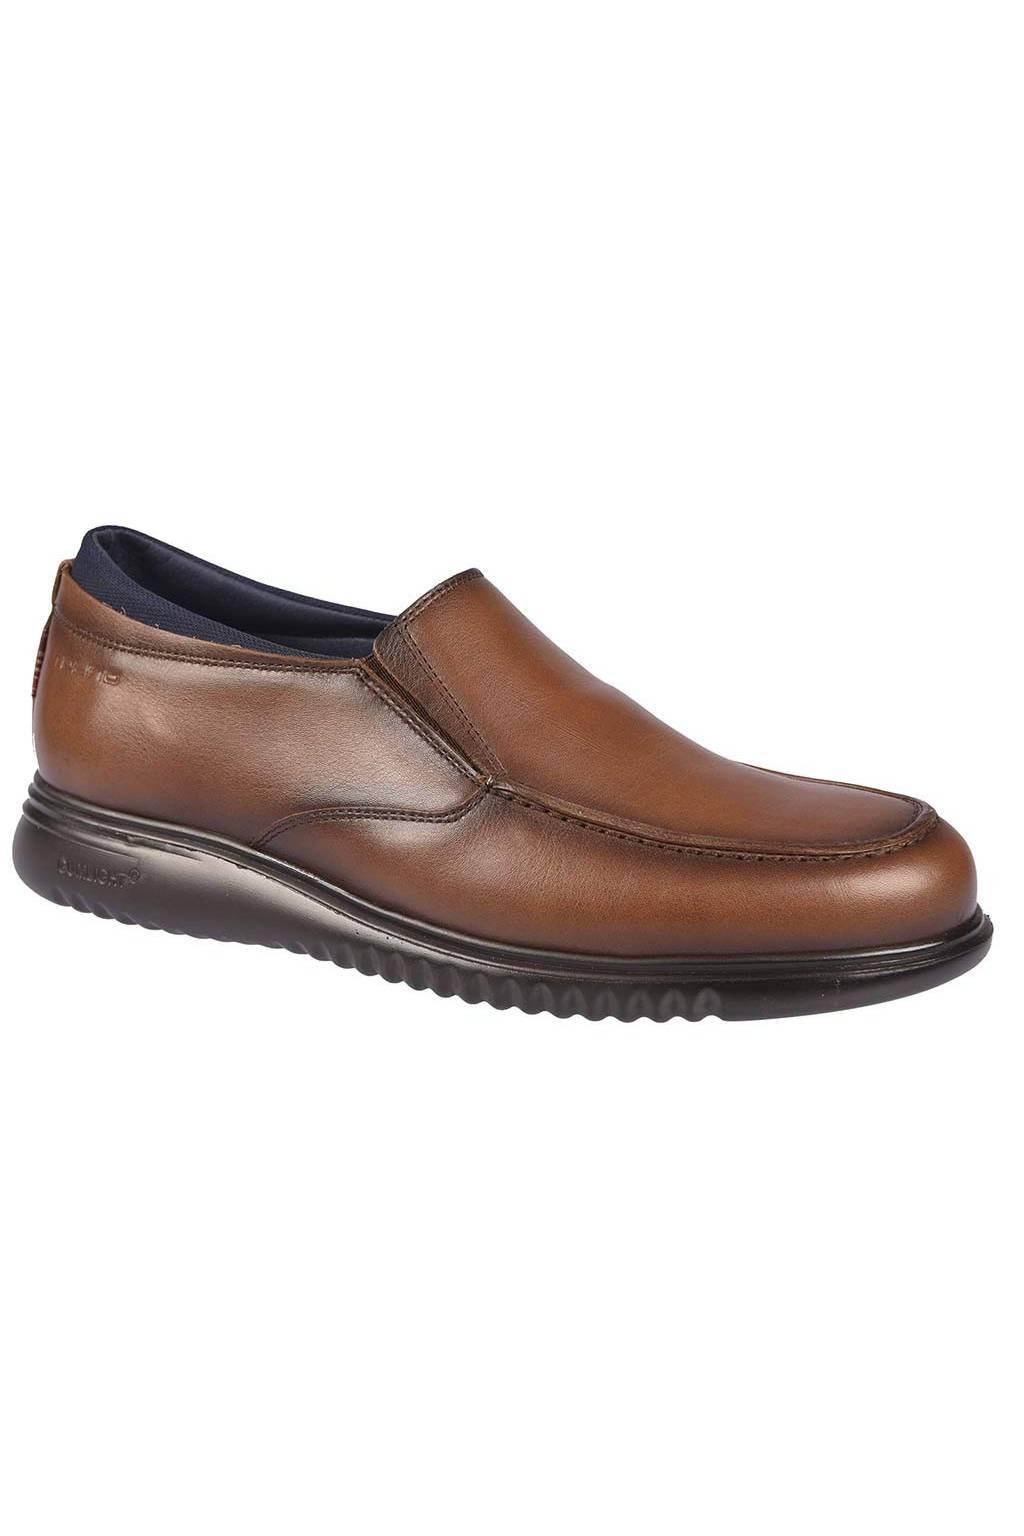 1a7d65cade7 Reduced price! zapato de hombre tolino 65811 cuero